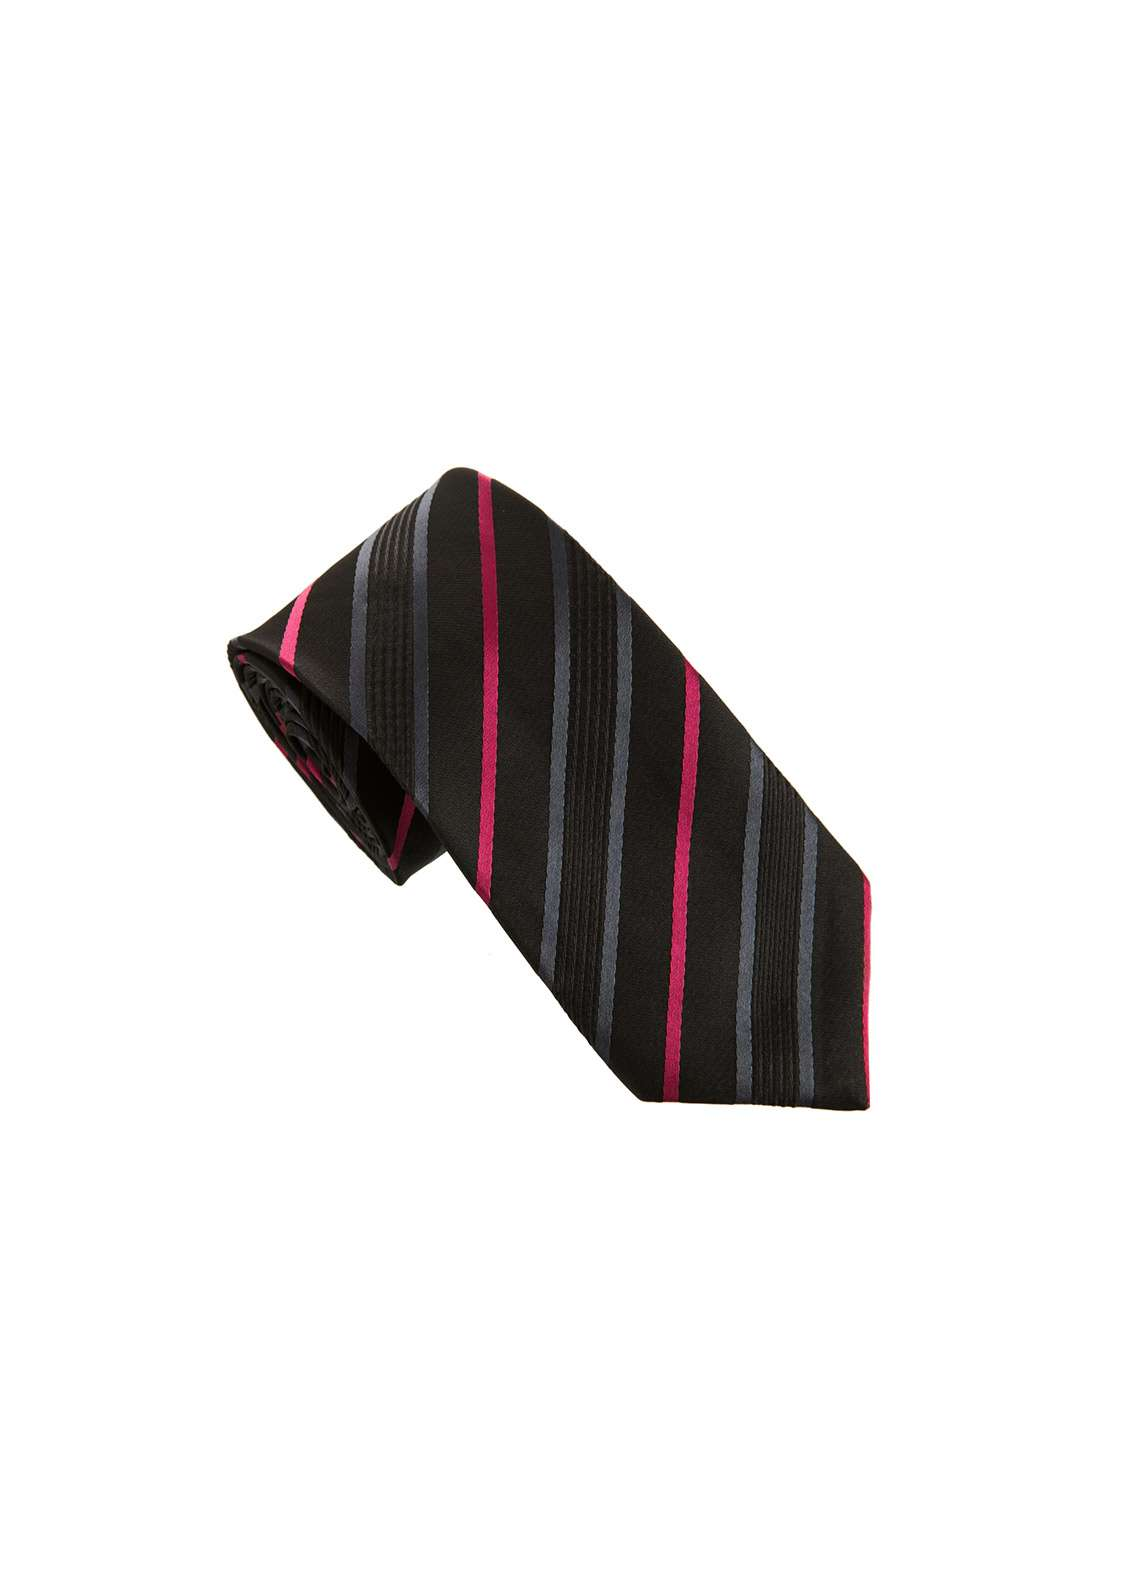 The Gentlemen's Club Black Striped Silk Tie for Men